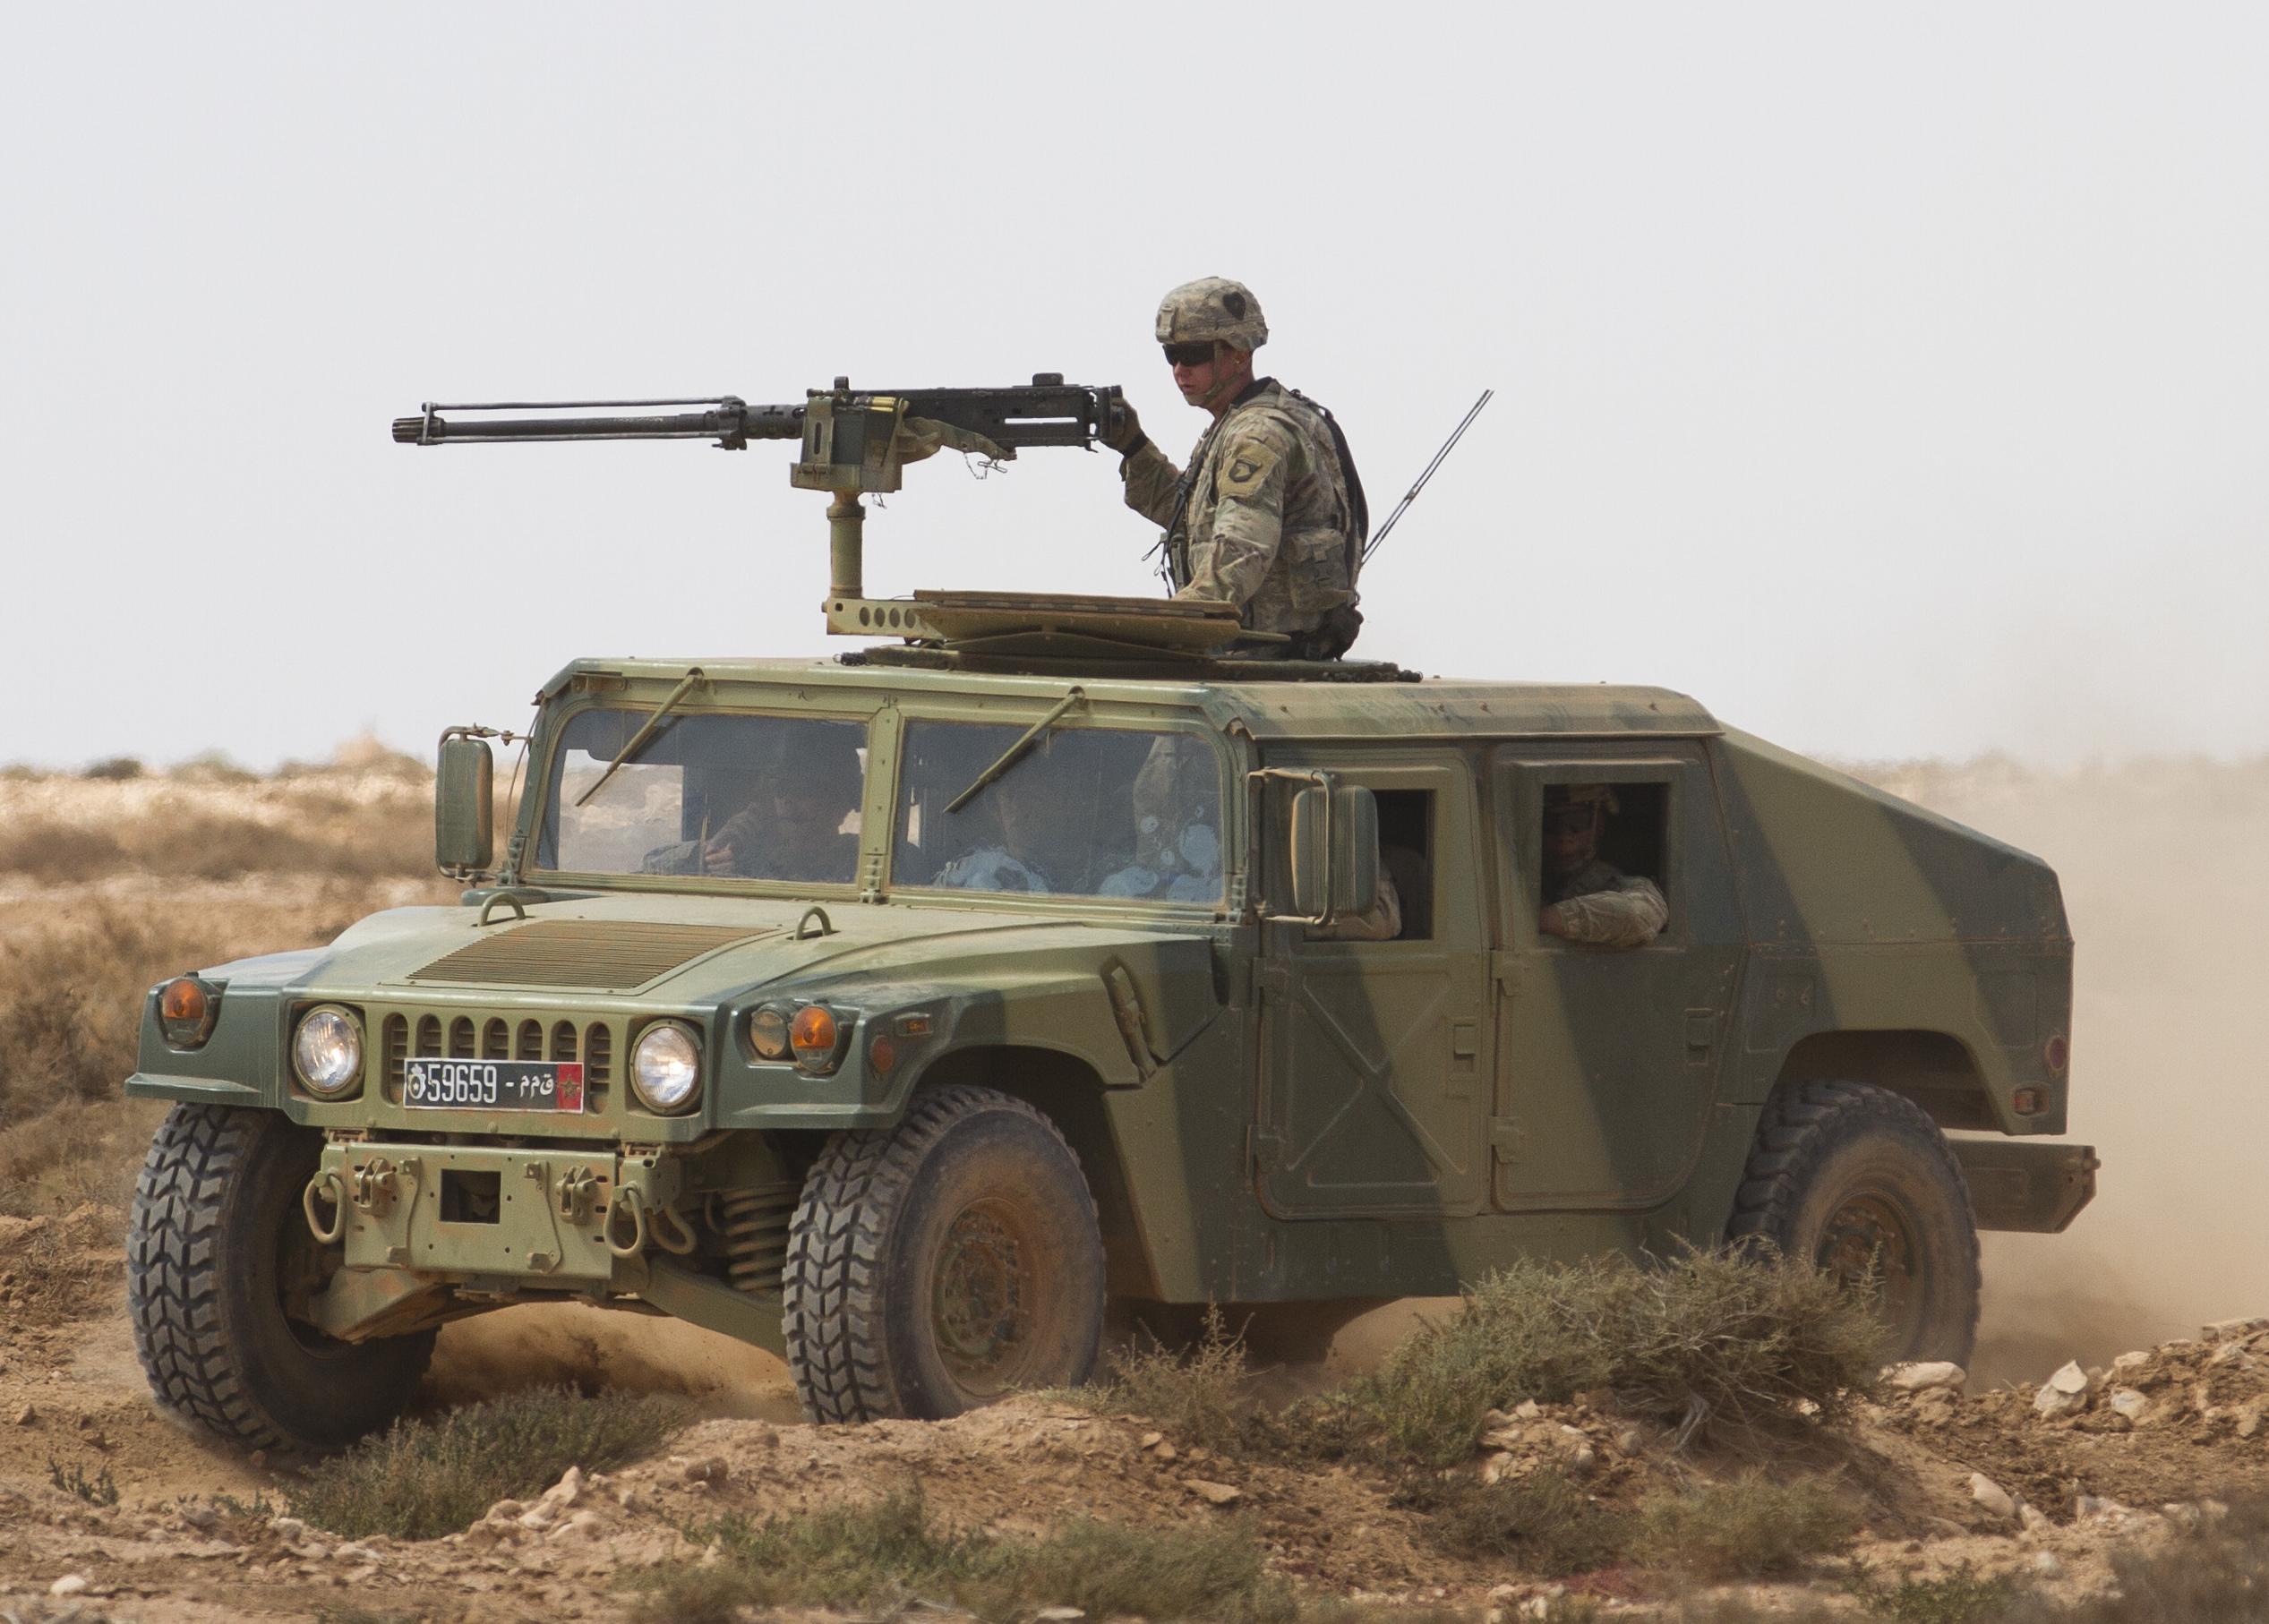 HMMWV et HMMWV Marine Armor Kit (MAK)  - Page 5 49250259231_4614e7b83a_o